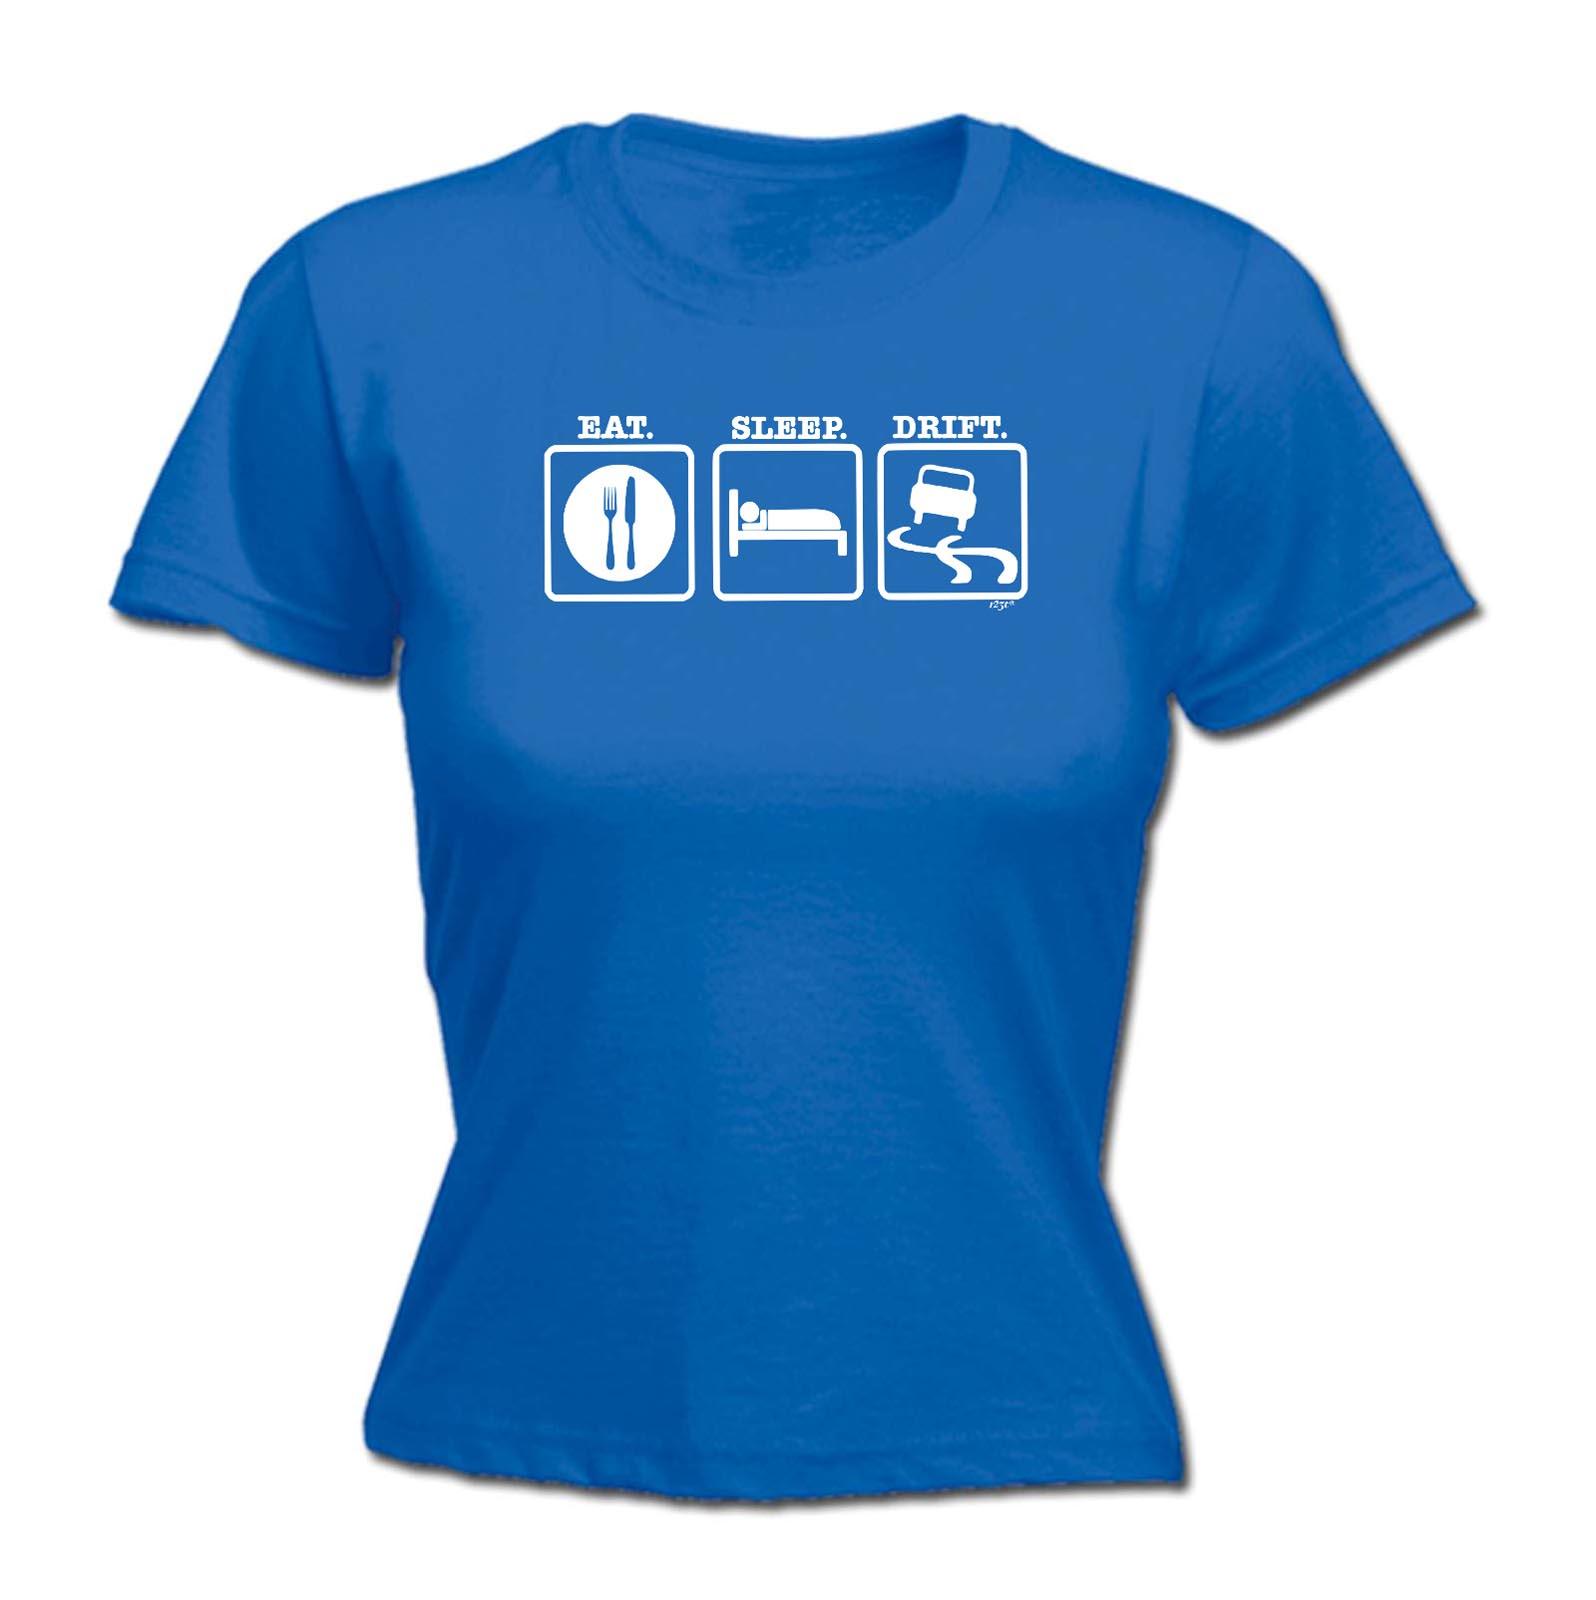 Funny-Novelty-Tops-T-Shirt-Womens-tee-TShirt-Eat-Sleep-Drift thumbnail 14